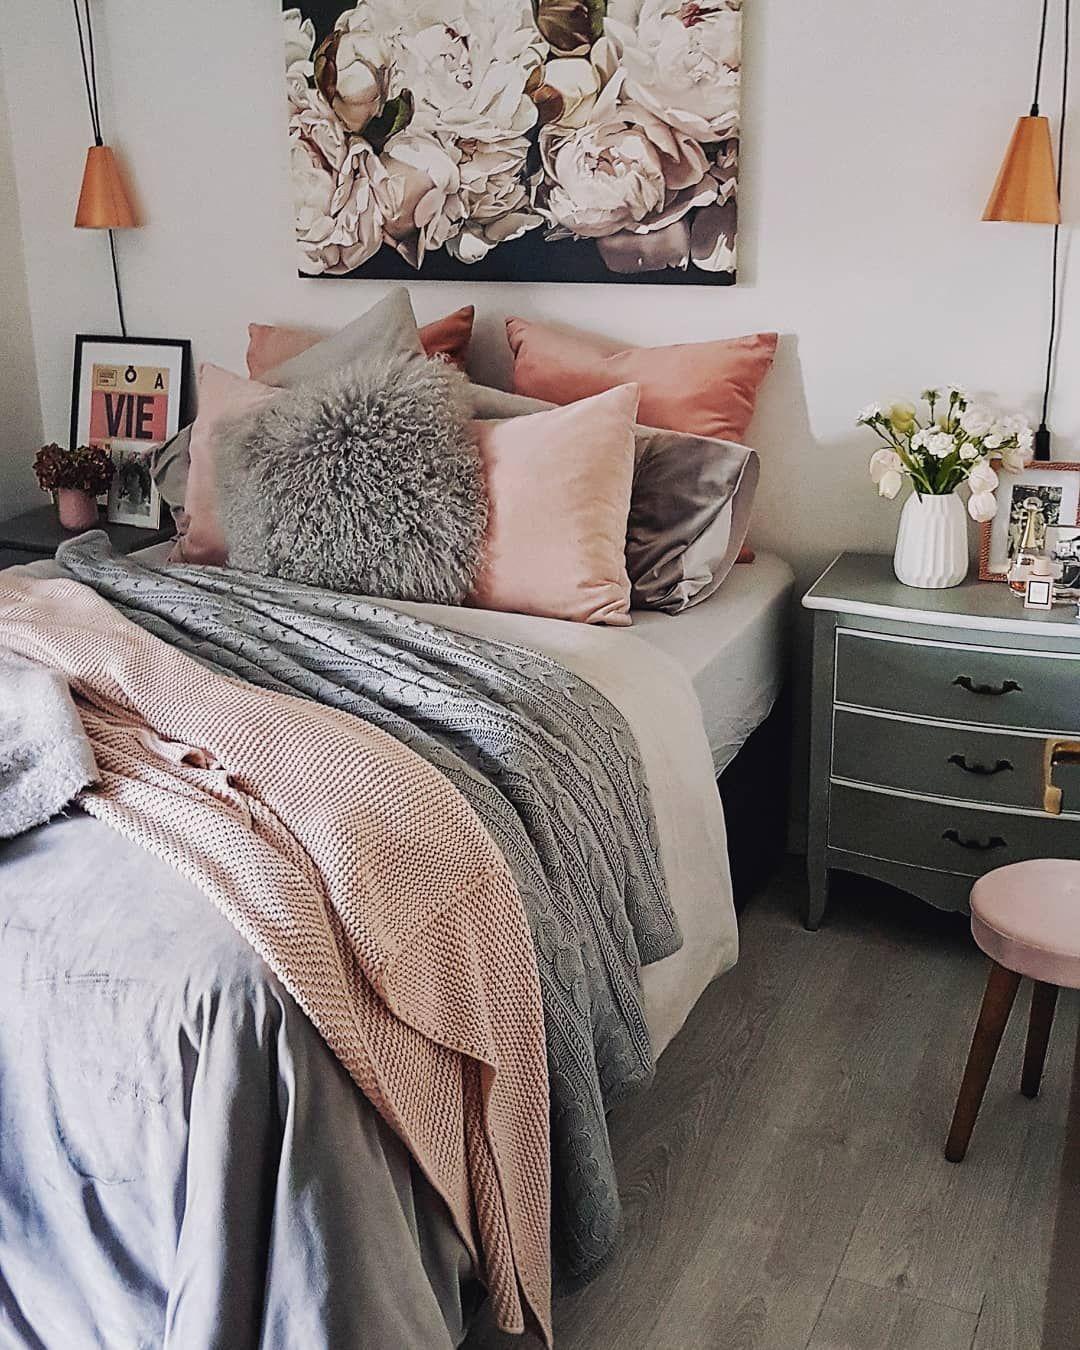 Astonishing Small Bedroom Decorating Ideas On A Budget Smallbedrooms Bedroom Bedroomdecor Bedroomideas Bed Small Bedroom Decor Bedroom Decor Small Bedroom